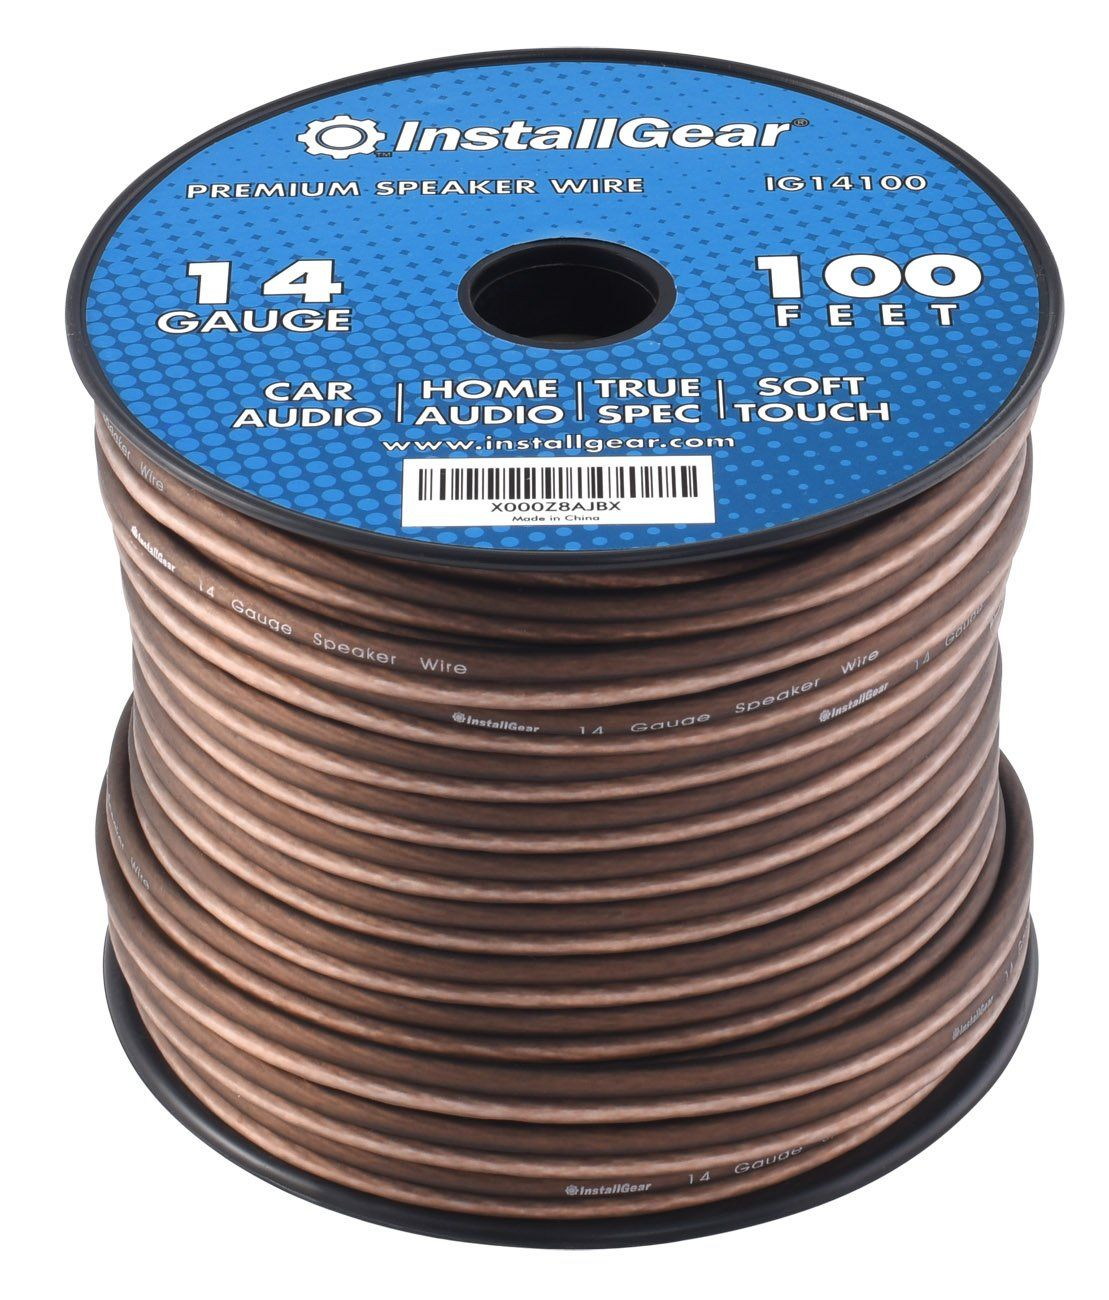 InstallGear 14 Gauge AWG 100ft Speaker Wire True Spec and Soft ...